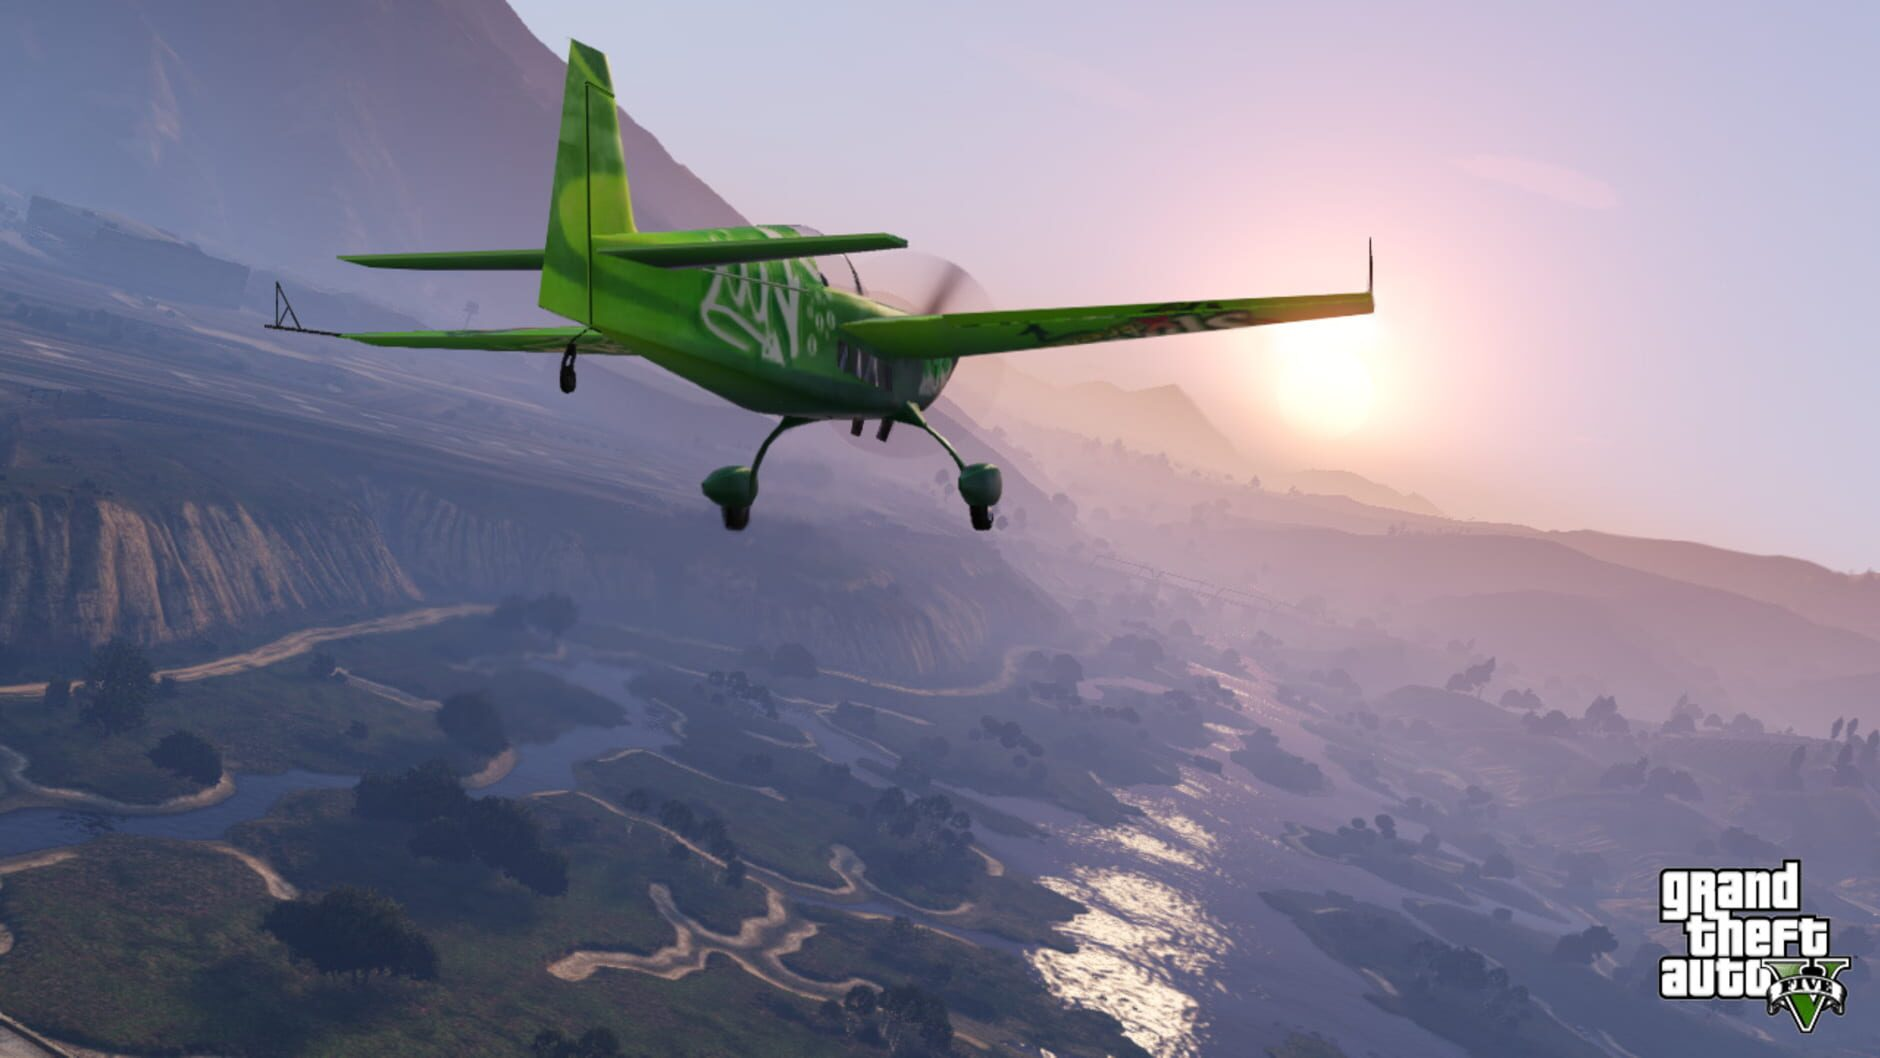 Grand Theft Auto V - 2